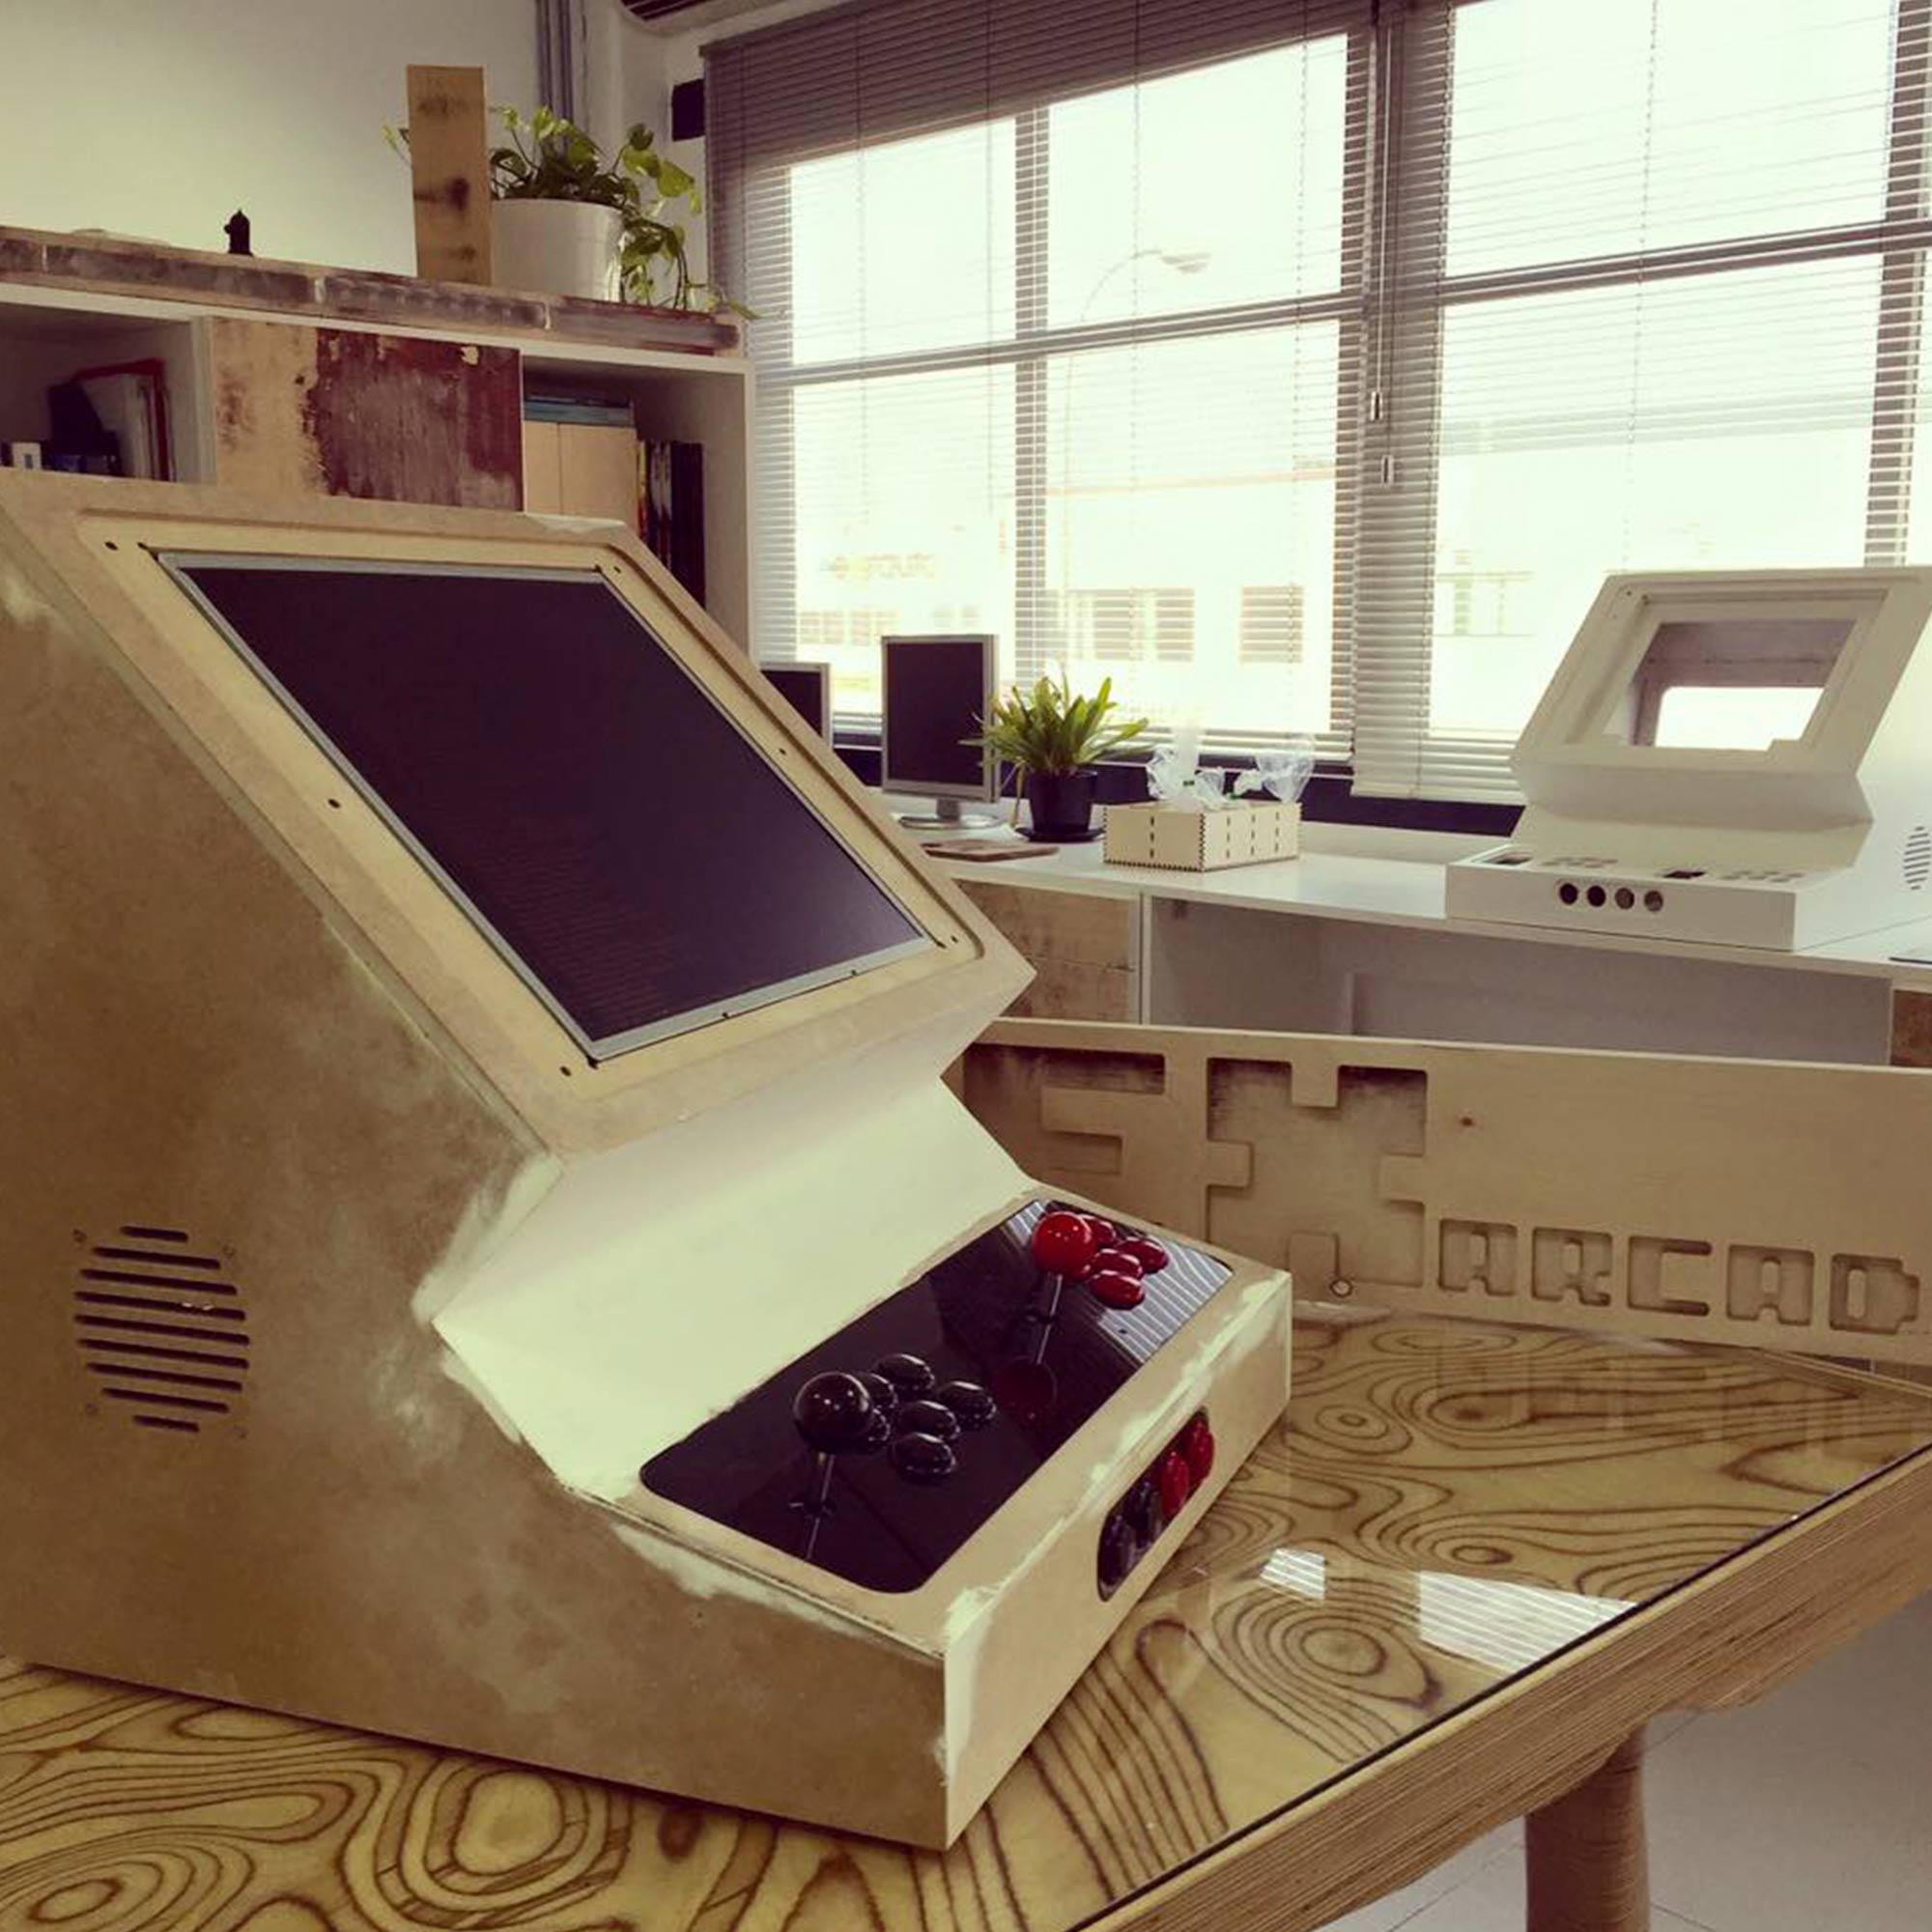 EX-arcade-_-Diseño-_-EXarchitects_07